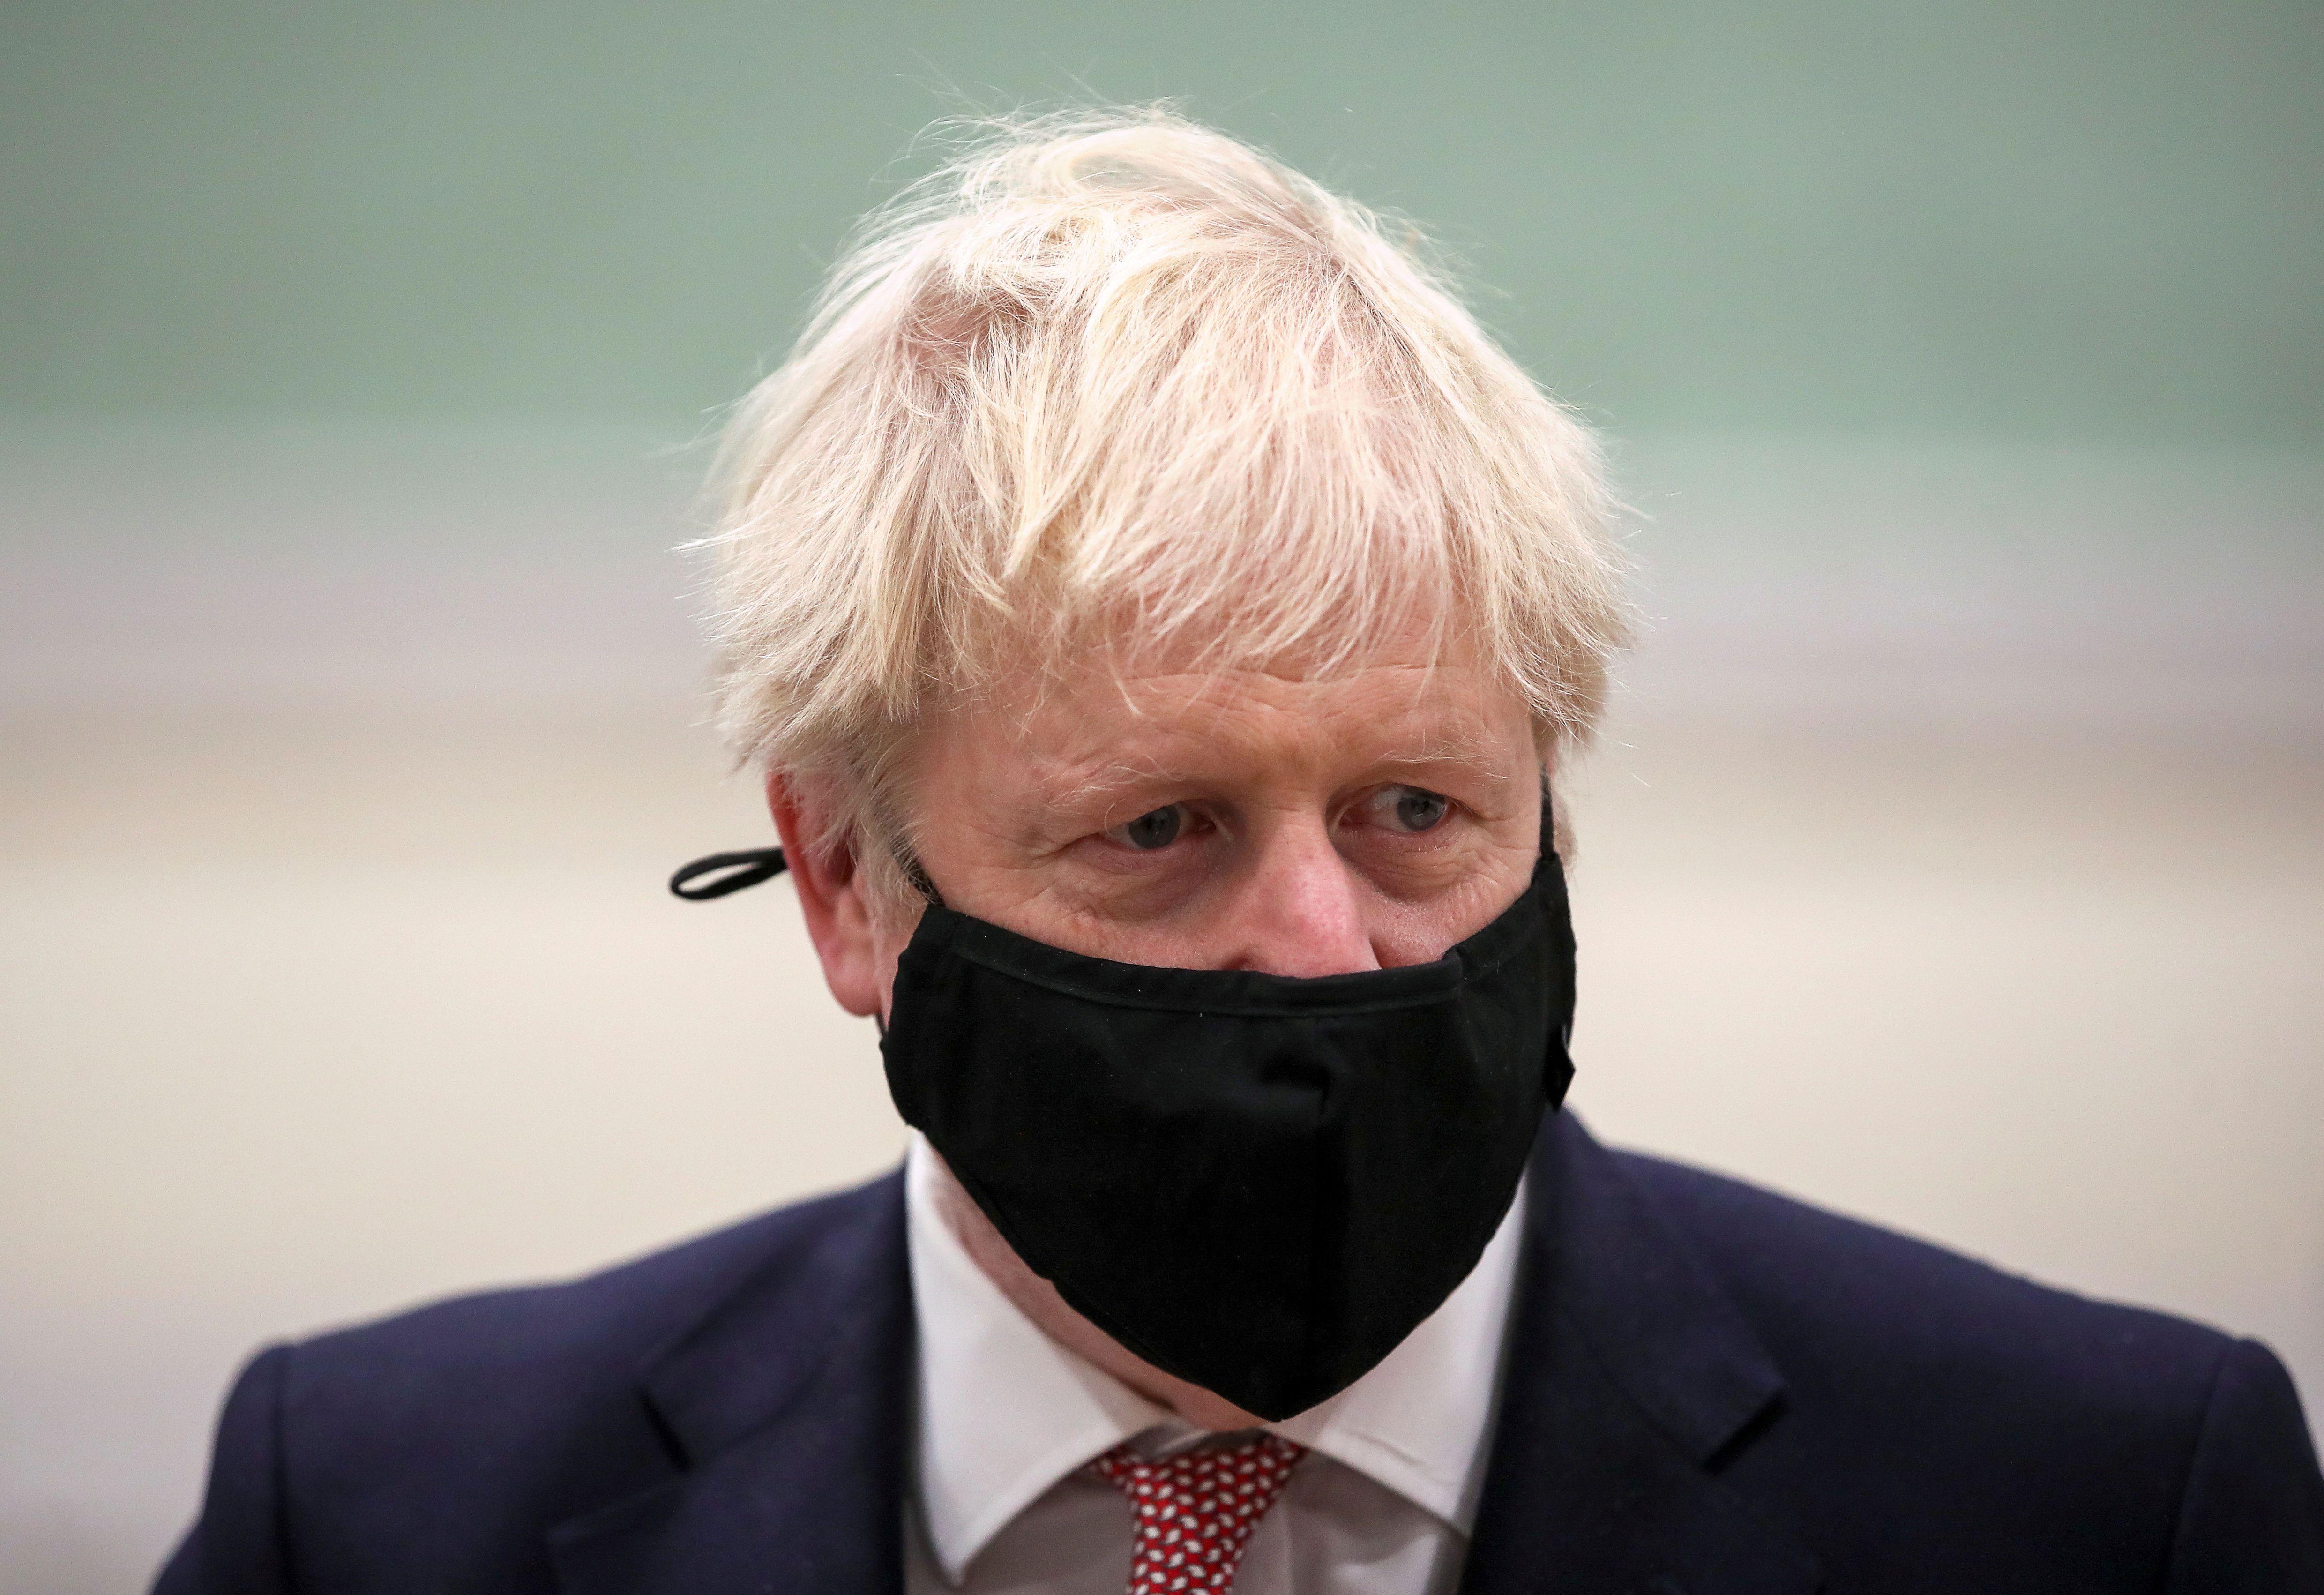 UK Prime Minister Boris Johnson visits the East Midlands region in England on November 6.